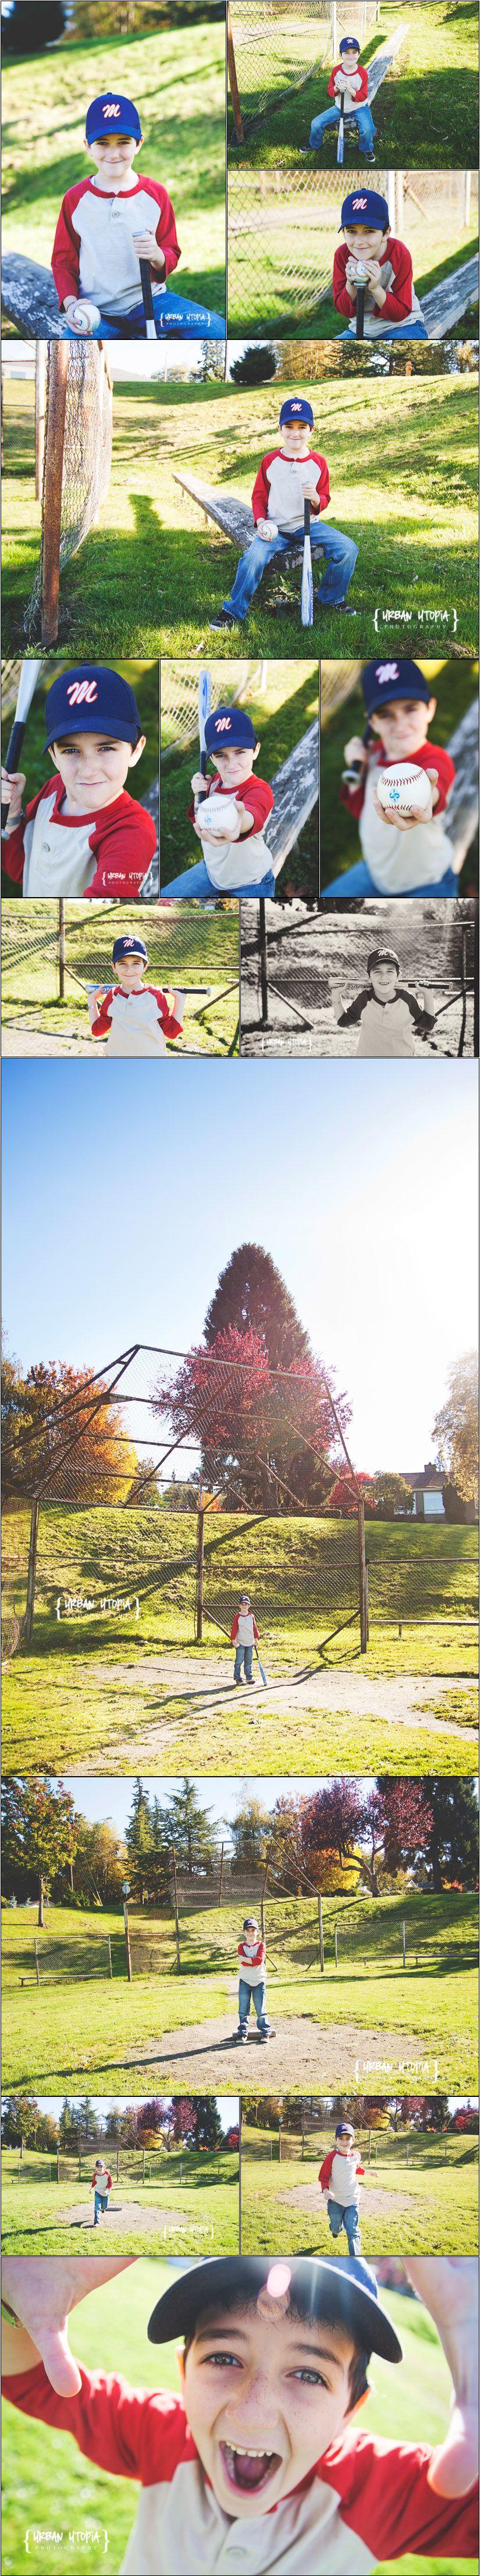 Urban Utopia Photography - Seattle Photographer and Beyond 7 year old boy session, baseball child session, baseball session, child session, boy child session, birthday session, birthday boy session, seattle photographer, everett child photographer www.urbanutopiaphotography.com